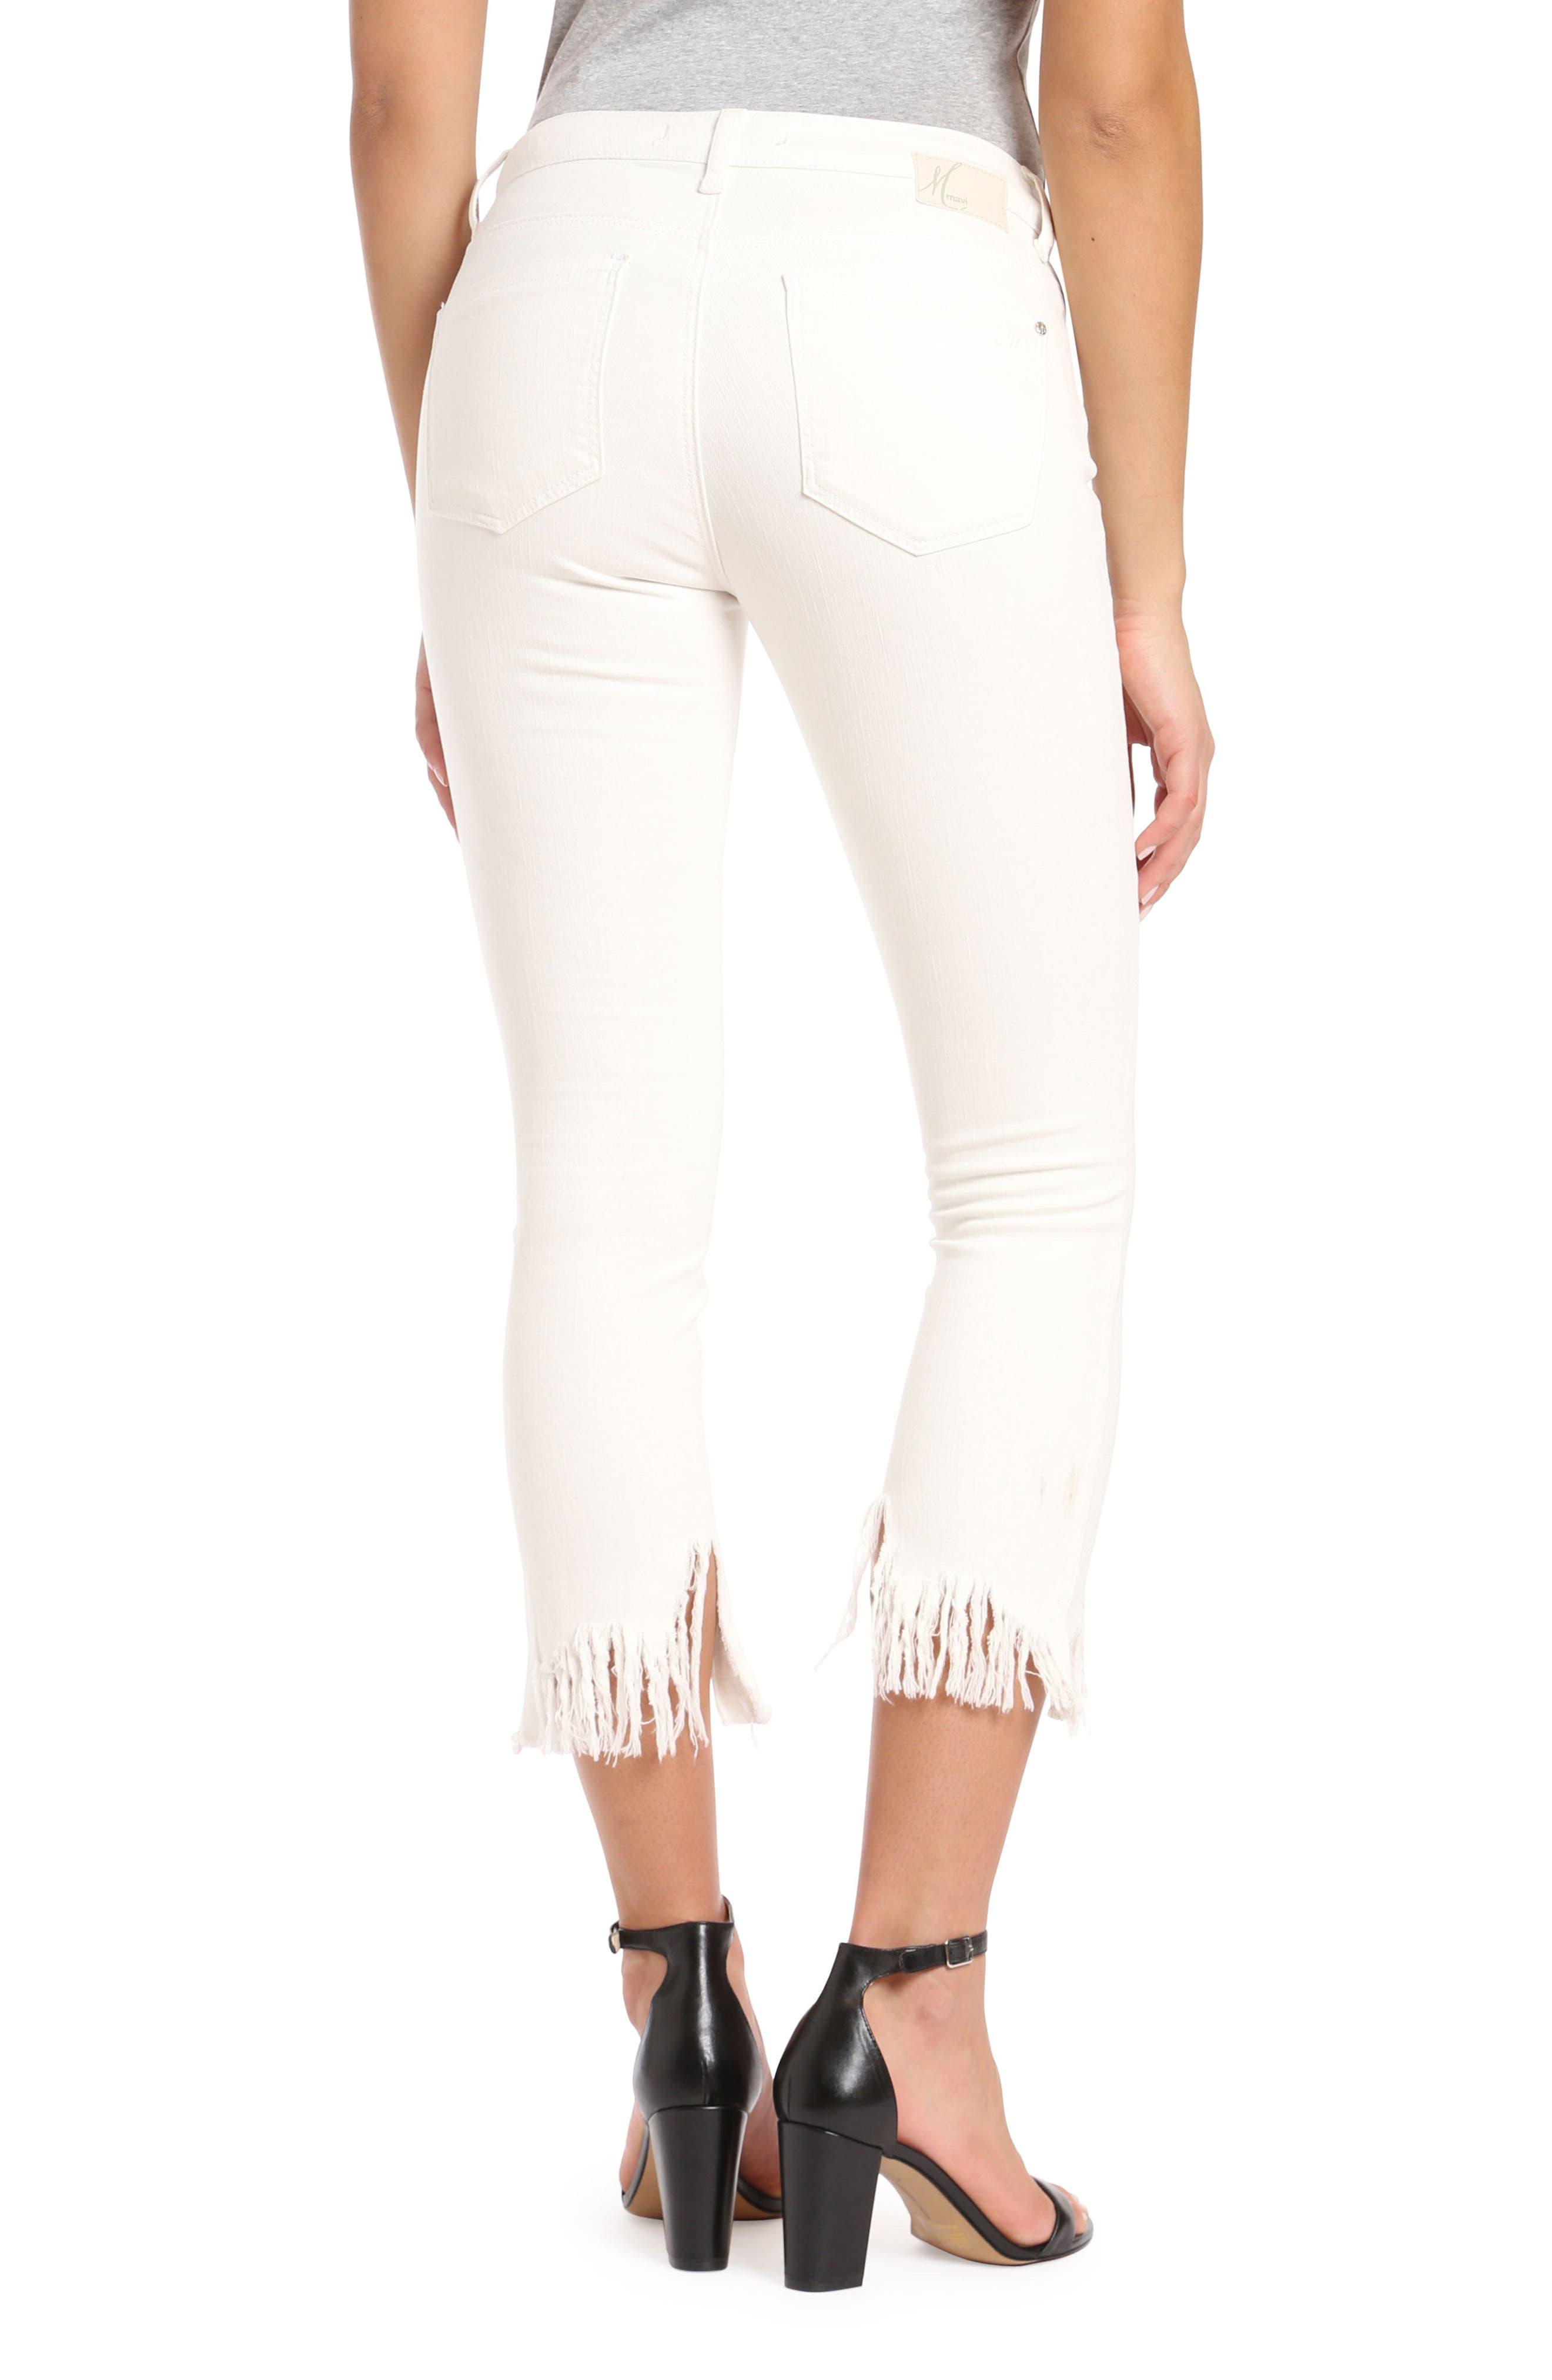 Mavi Tess Vintage Fringe Super Skinny Jeans,                             Alternate thumbnail 2, color,                             White Fringe Vintage